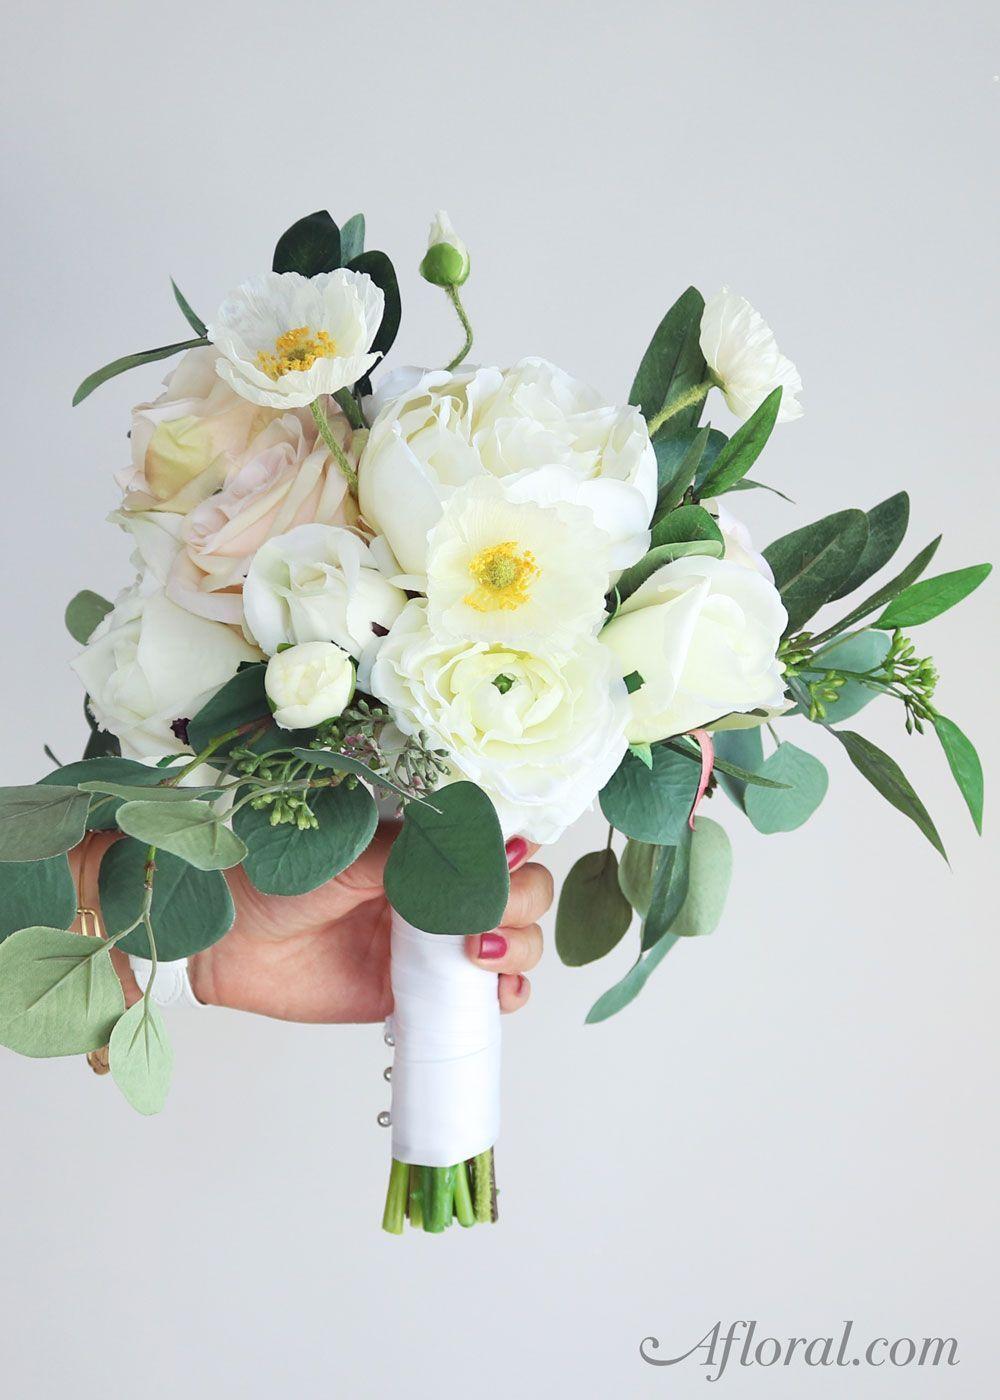 Silk Flower Wedding Bouquet. Make your own bridal bouquet with fake ...